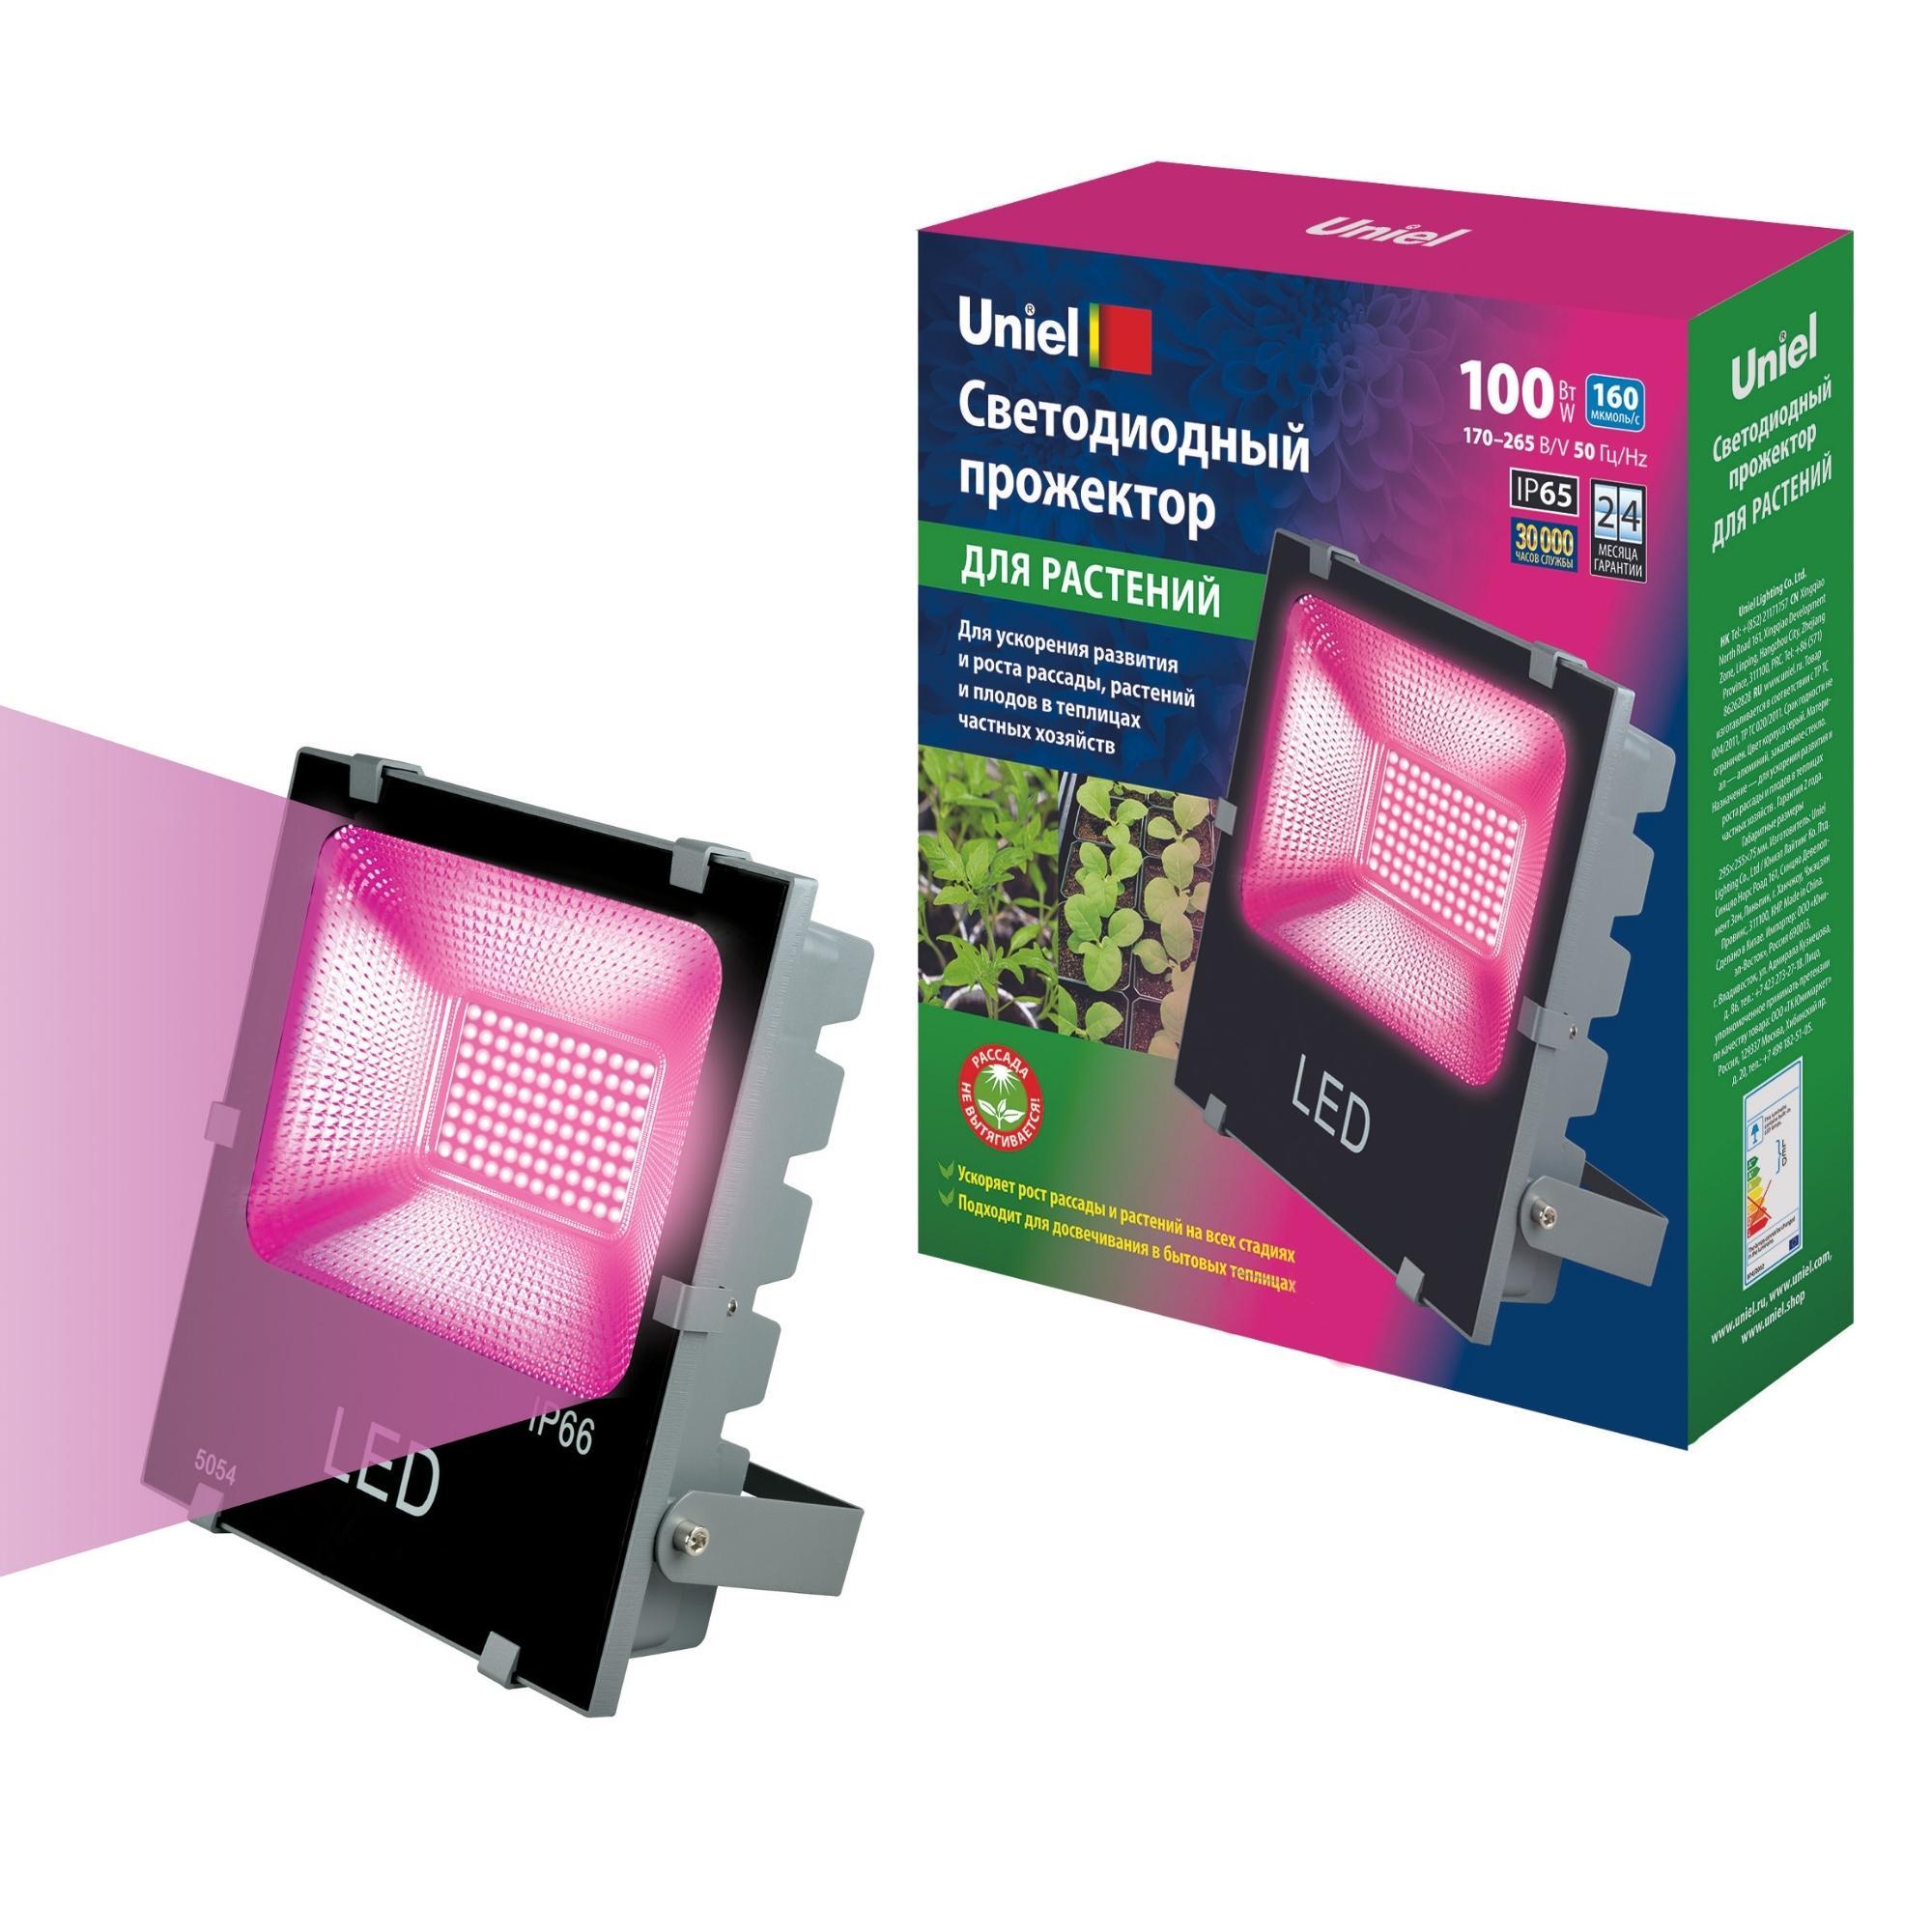 ULF-P41-100W/SPBR IP65 170-265В GREY картон